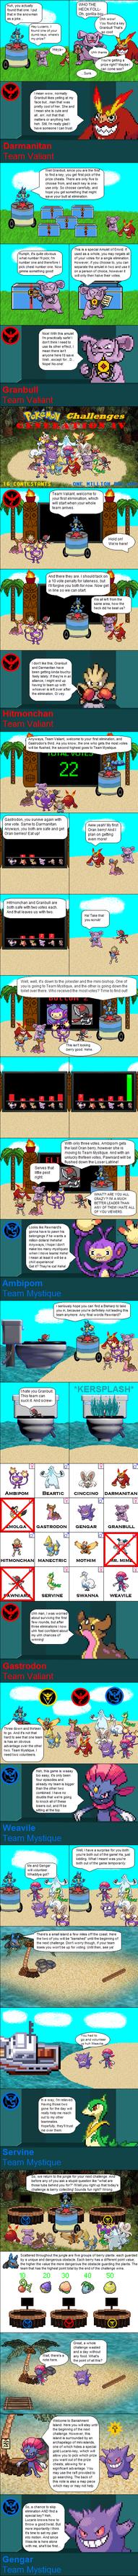 Pokemon Challenges Gen IV Episode 4 - Part 1 by pokemonmanic3595